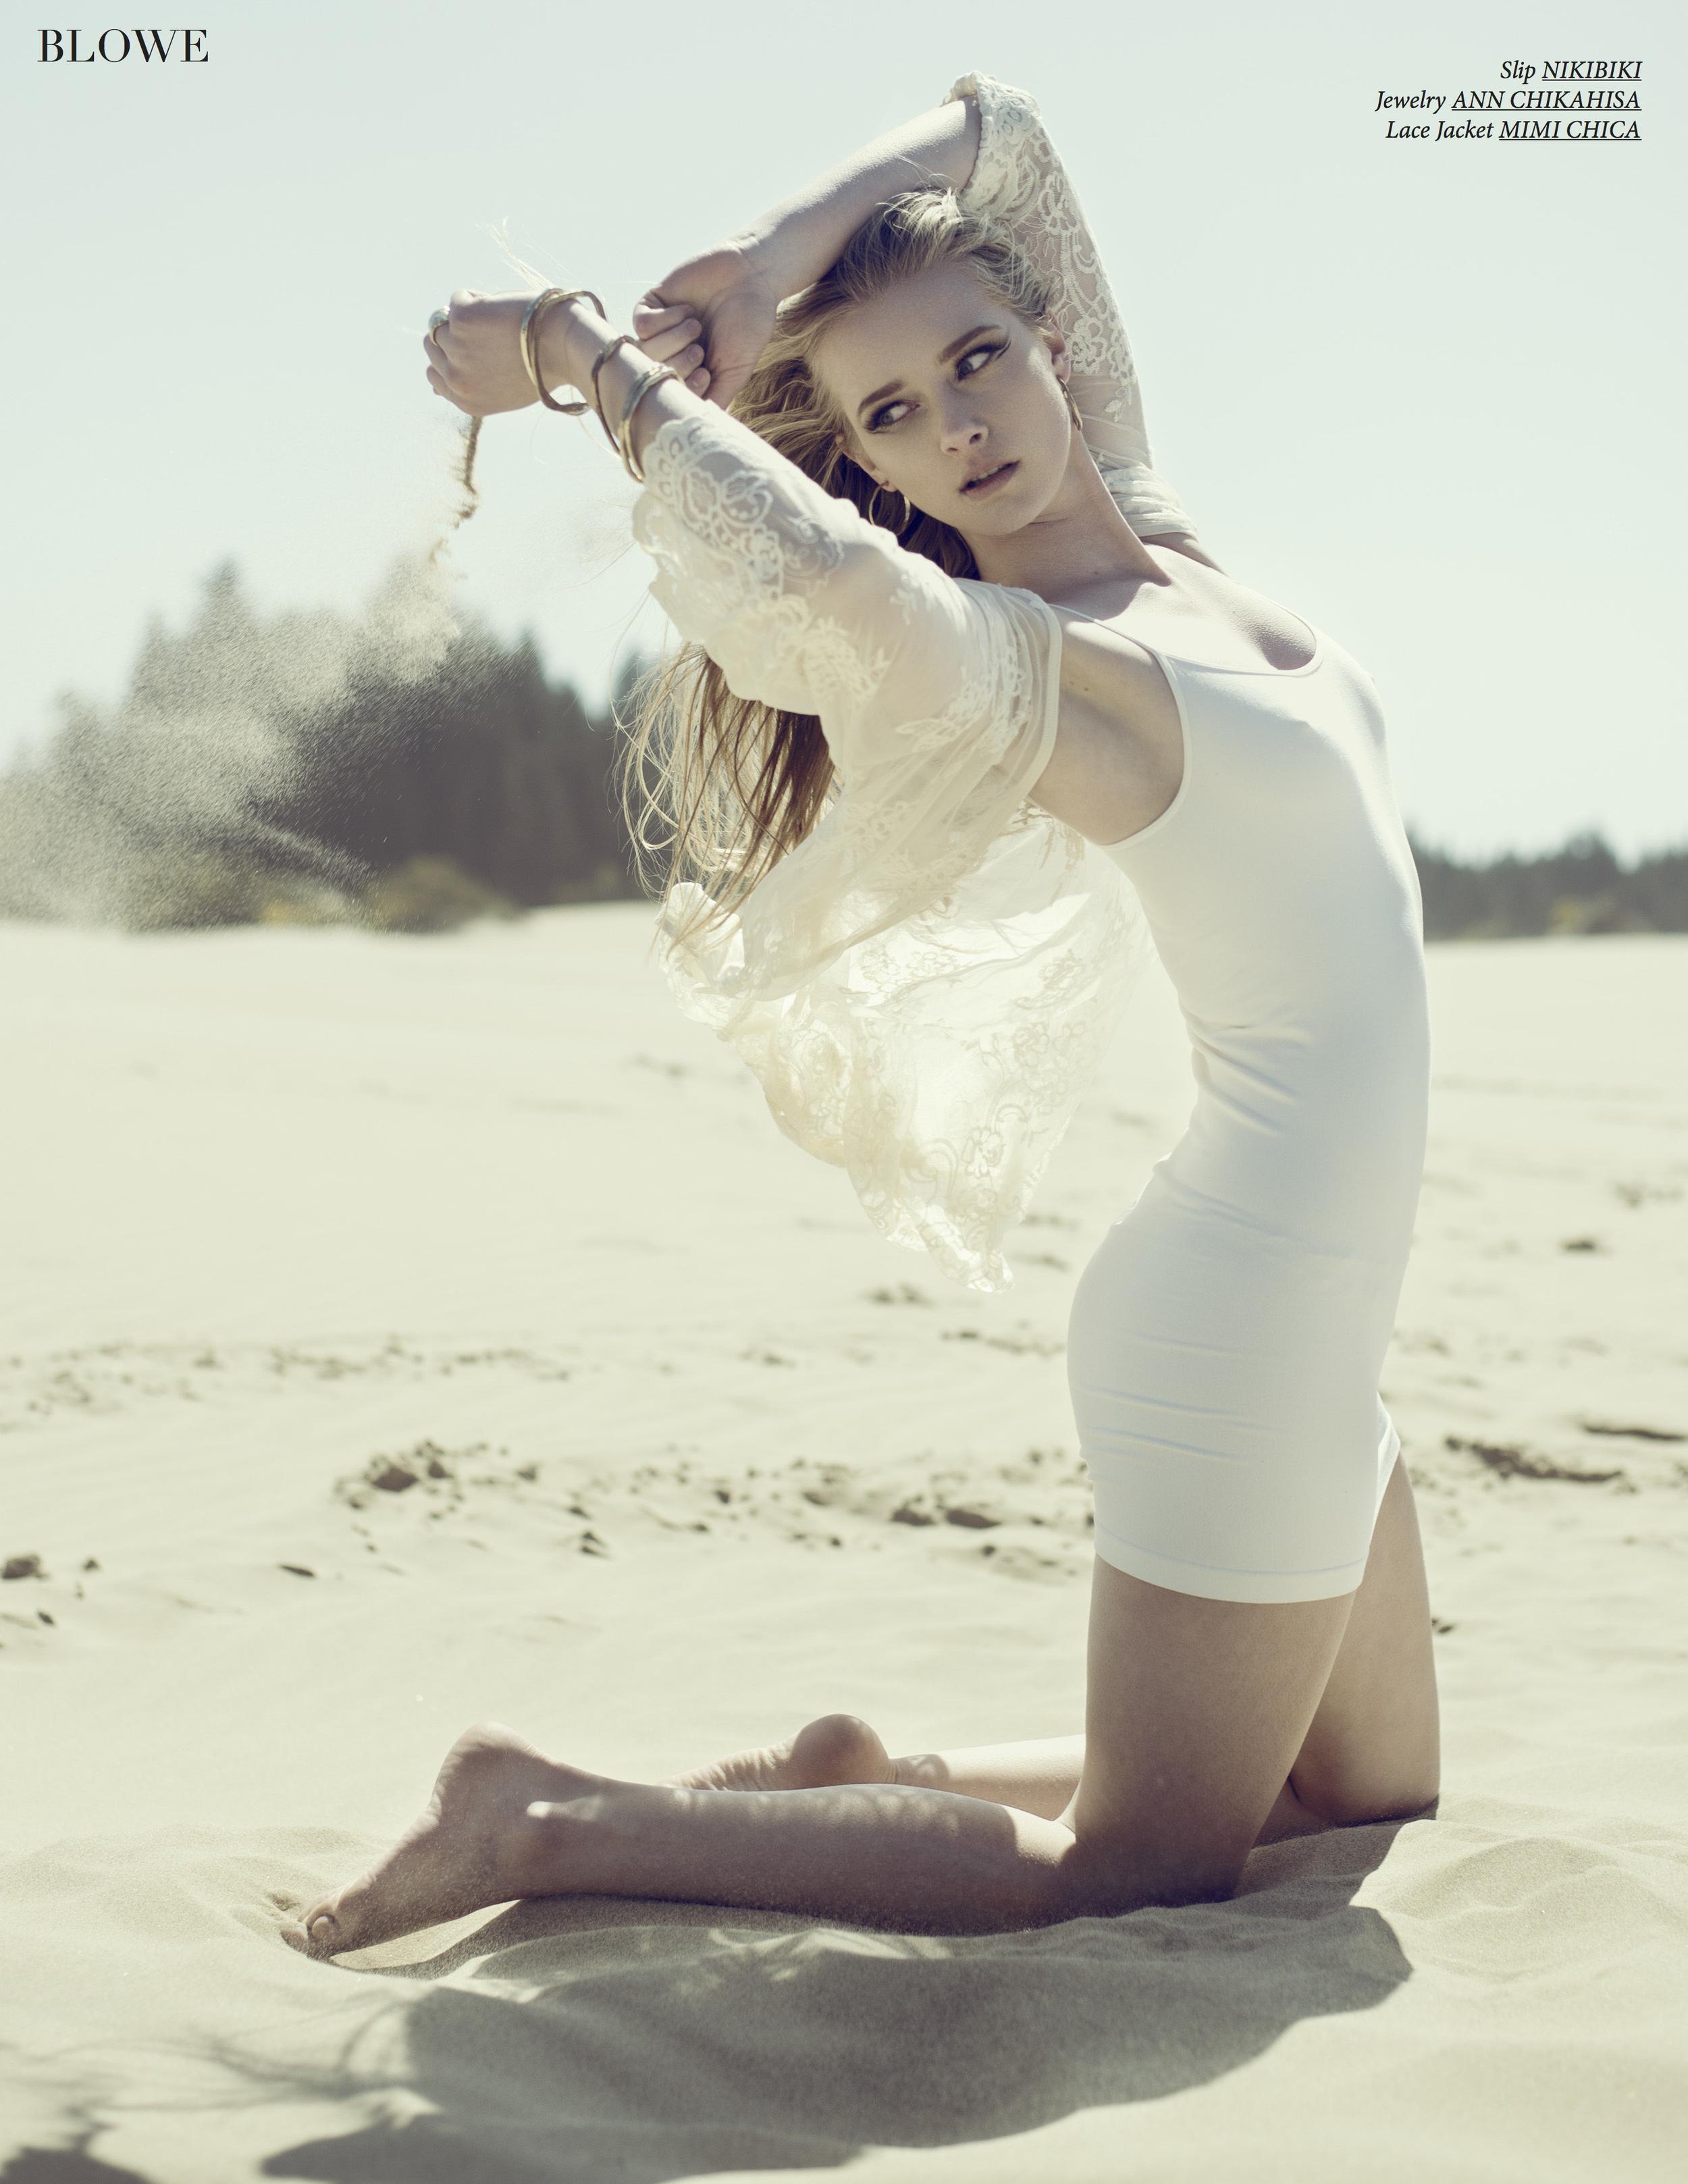 Blowe magazine editorial by fashion photographer Alecia Lindsay